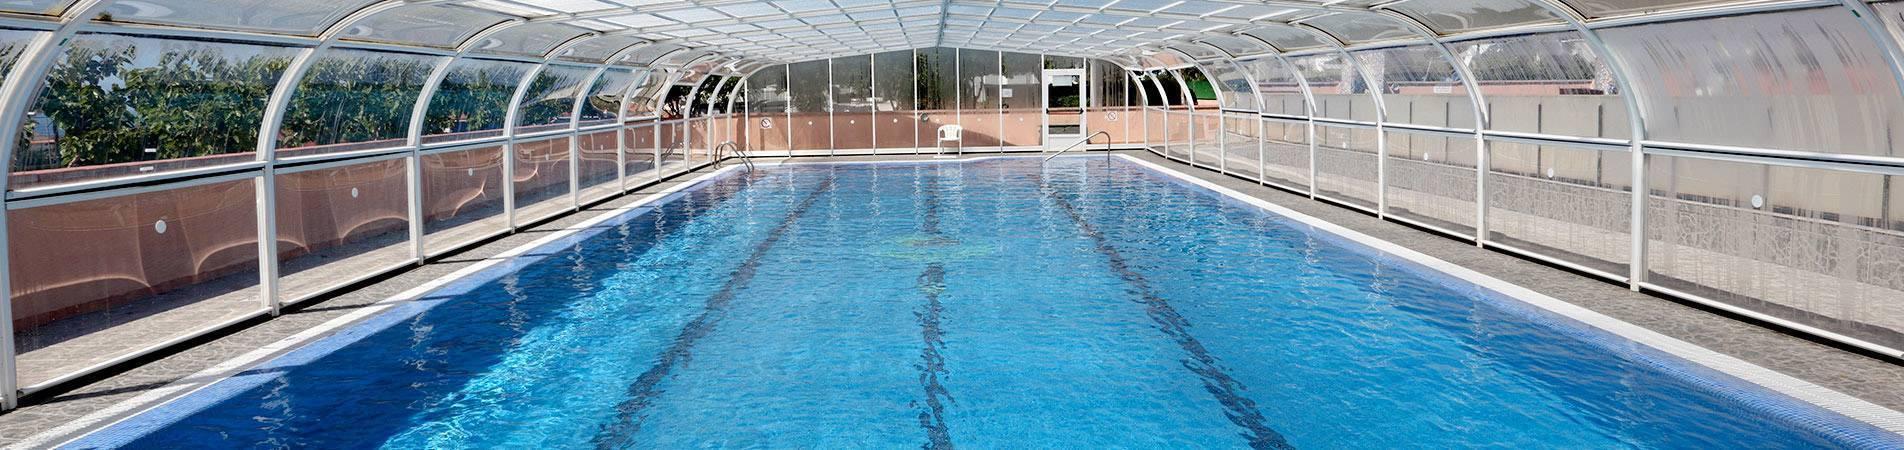 cubierta-piscina-grandes-dimensiones